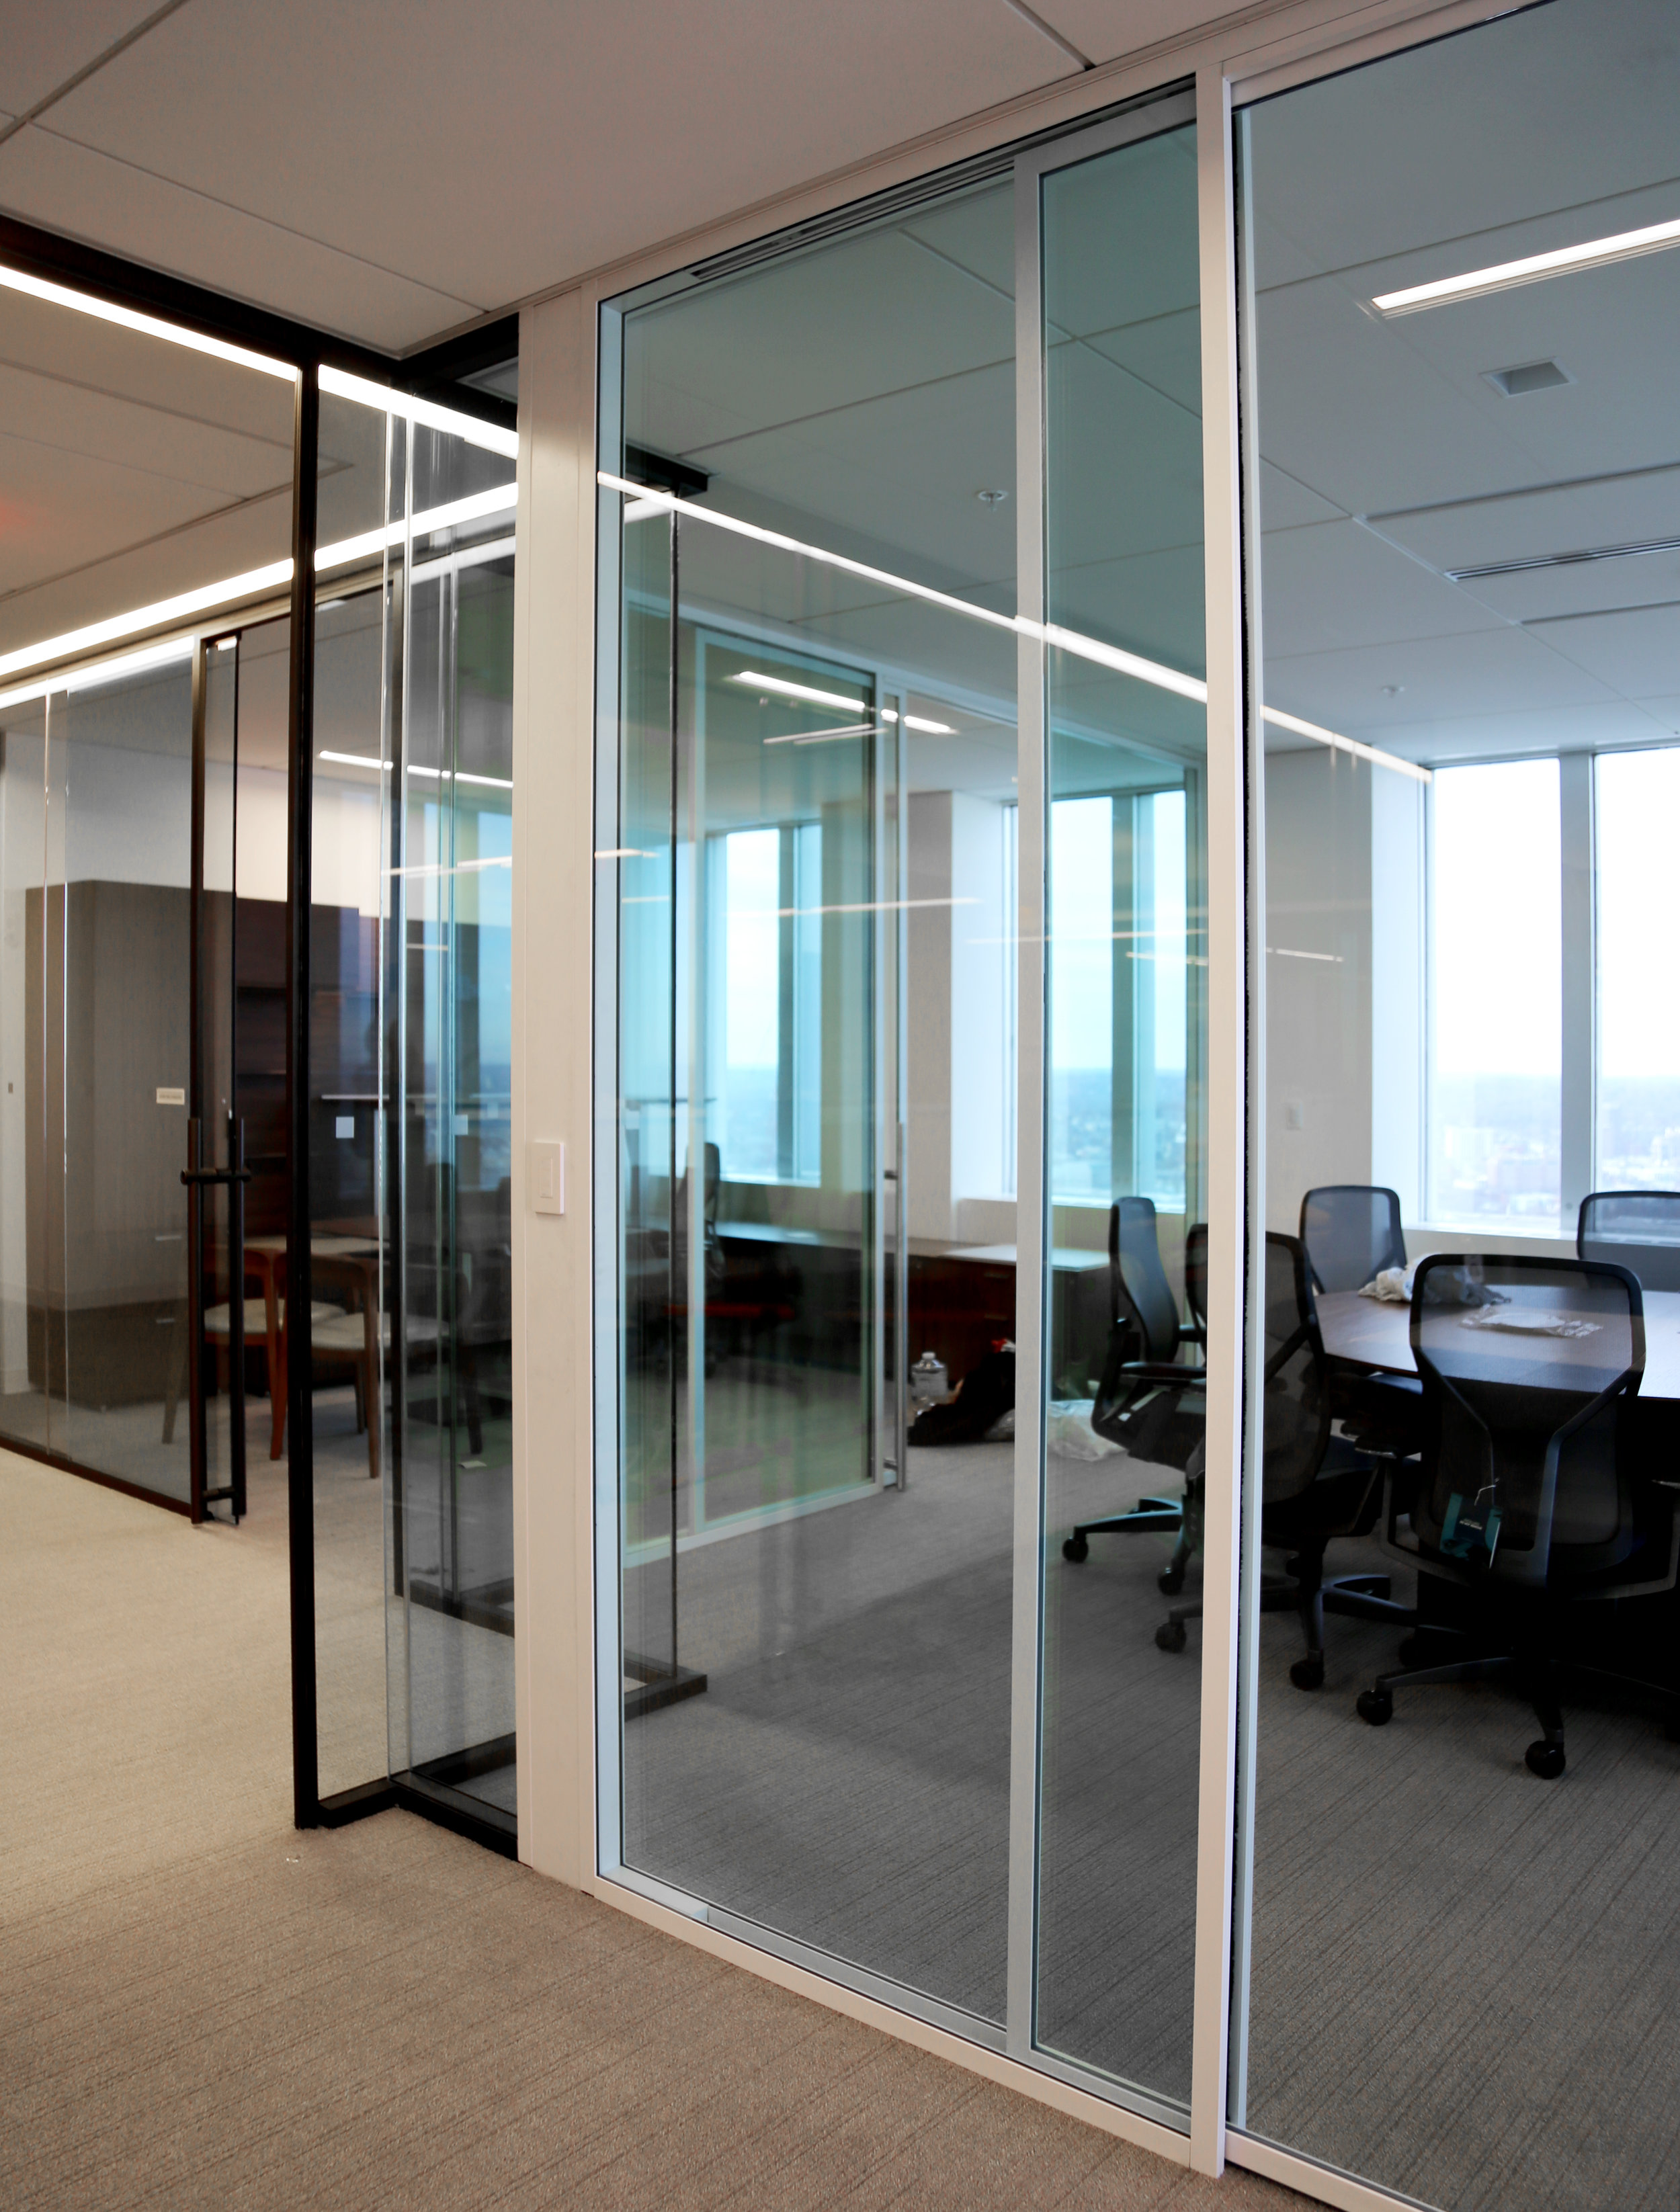 Modernus Demountable Dual Pane Glass System - Spaceworks AI.jpg